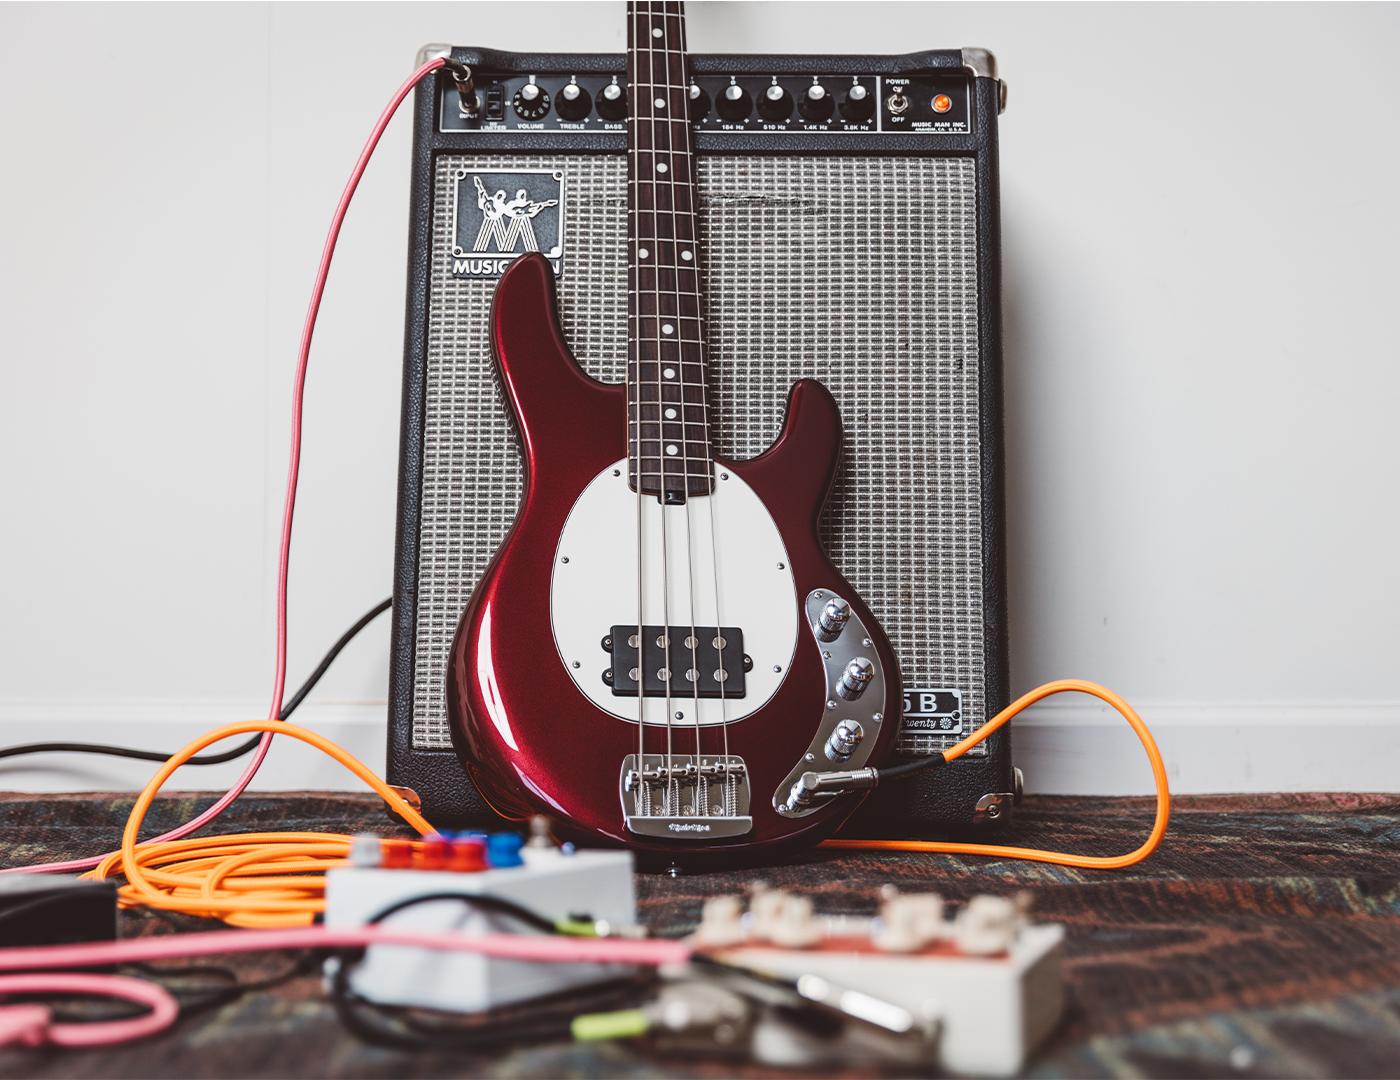 SS-StingRay-Bass-social-assets-Instagram-13.jpg